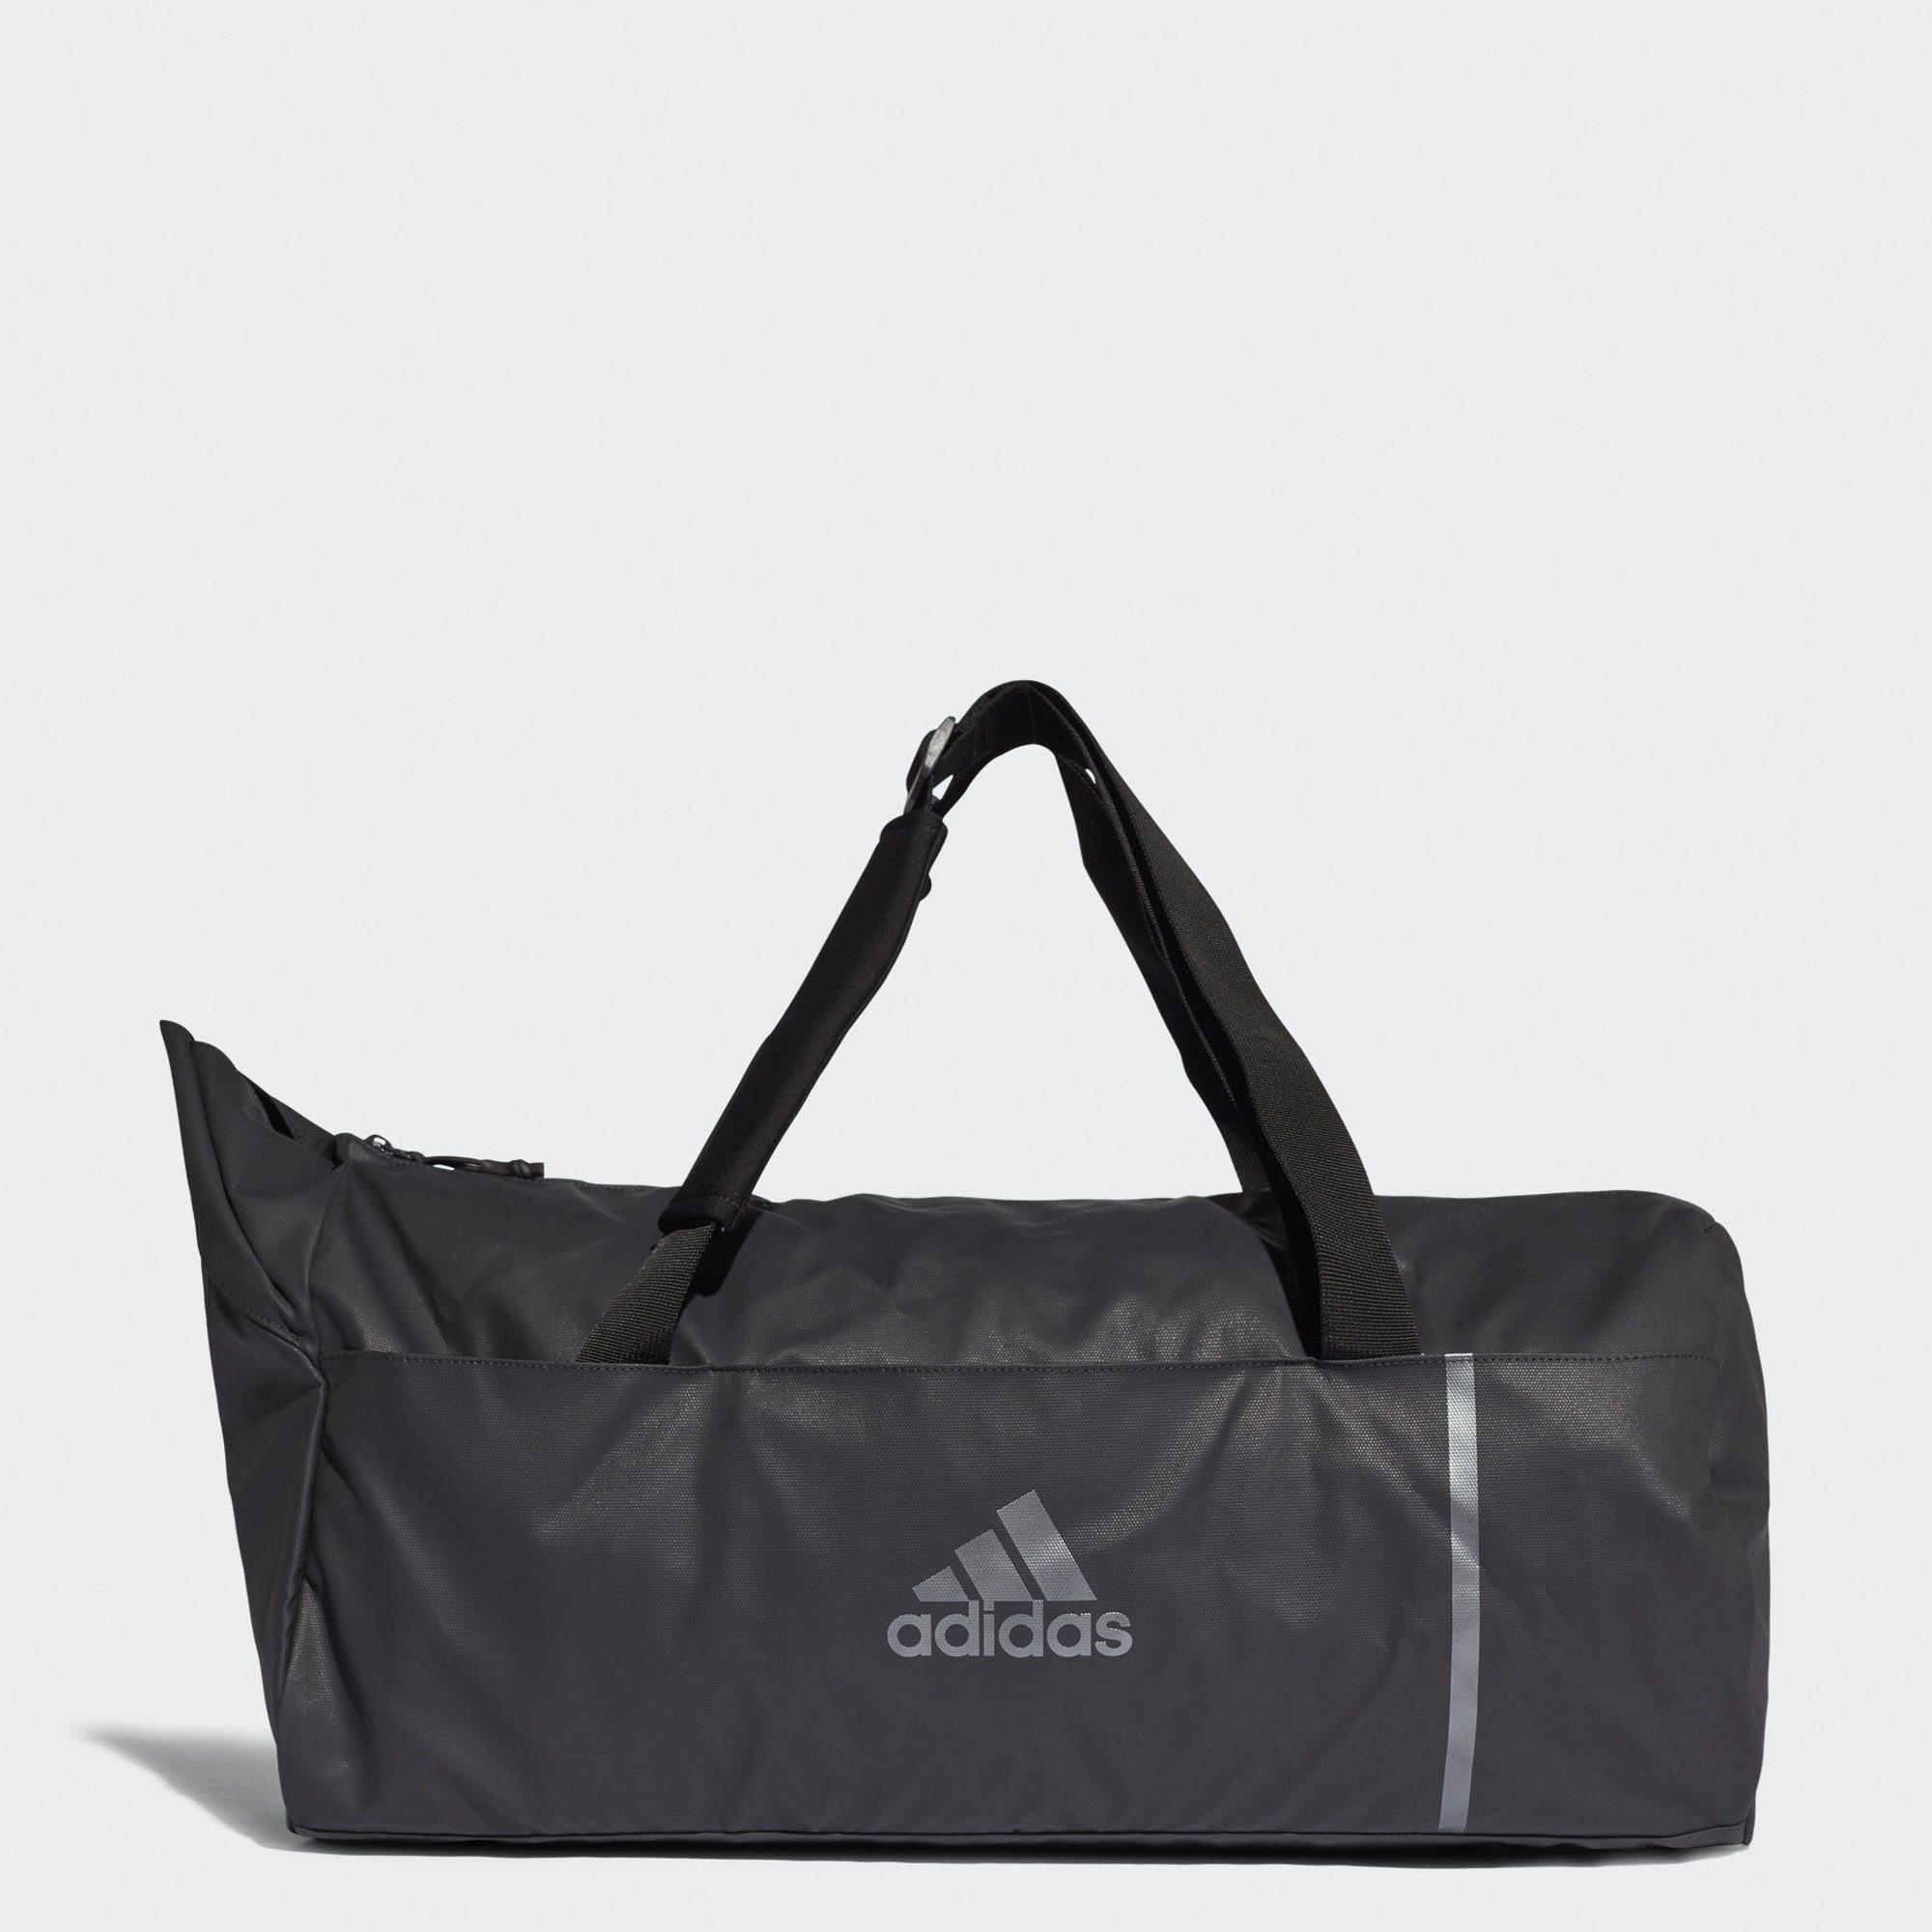 adidas Performance Sporttasche »Convertible Training M«